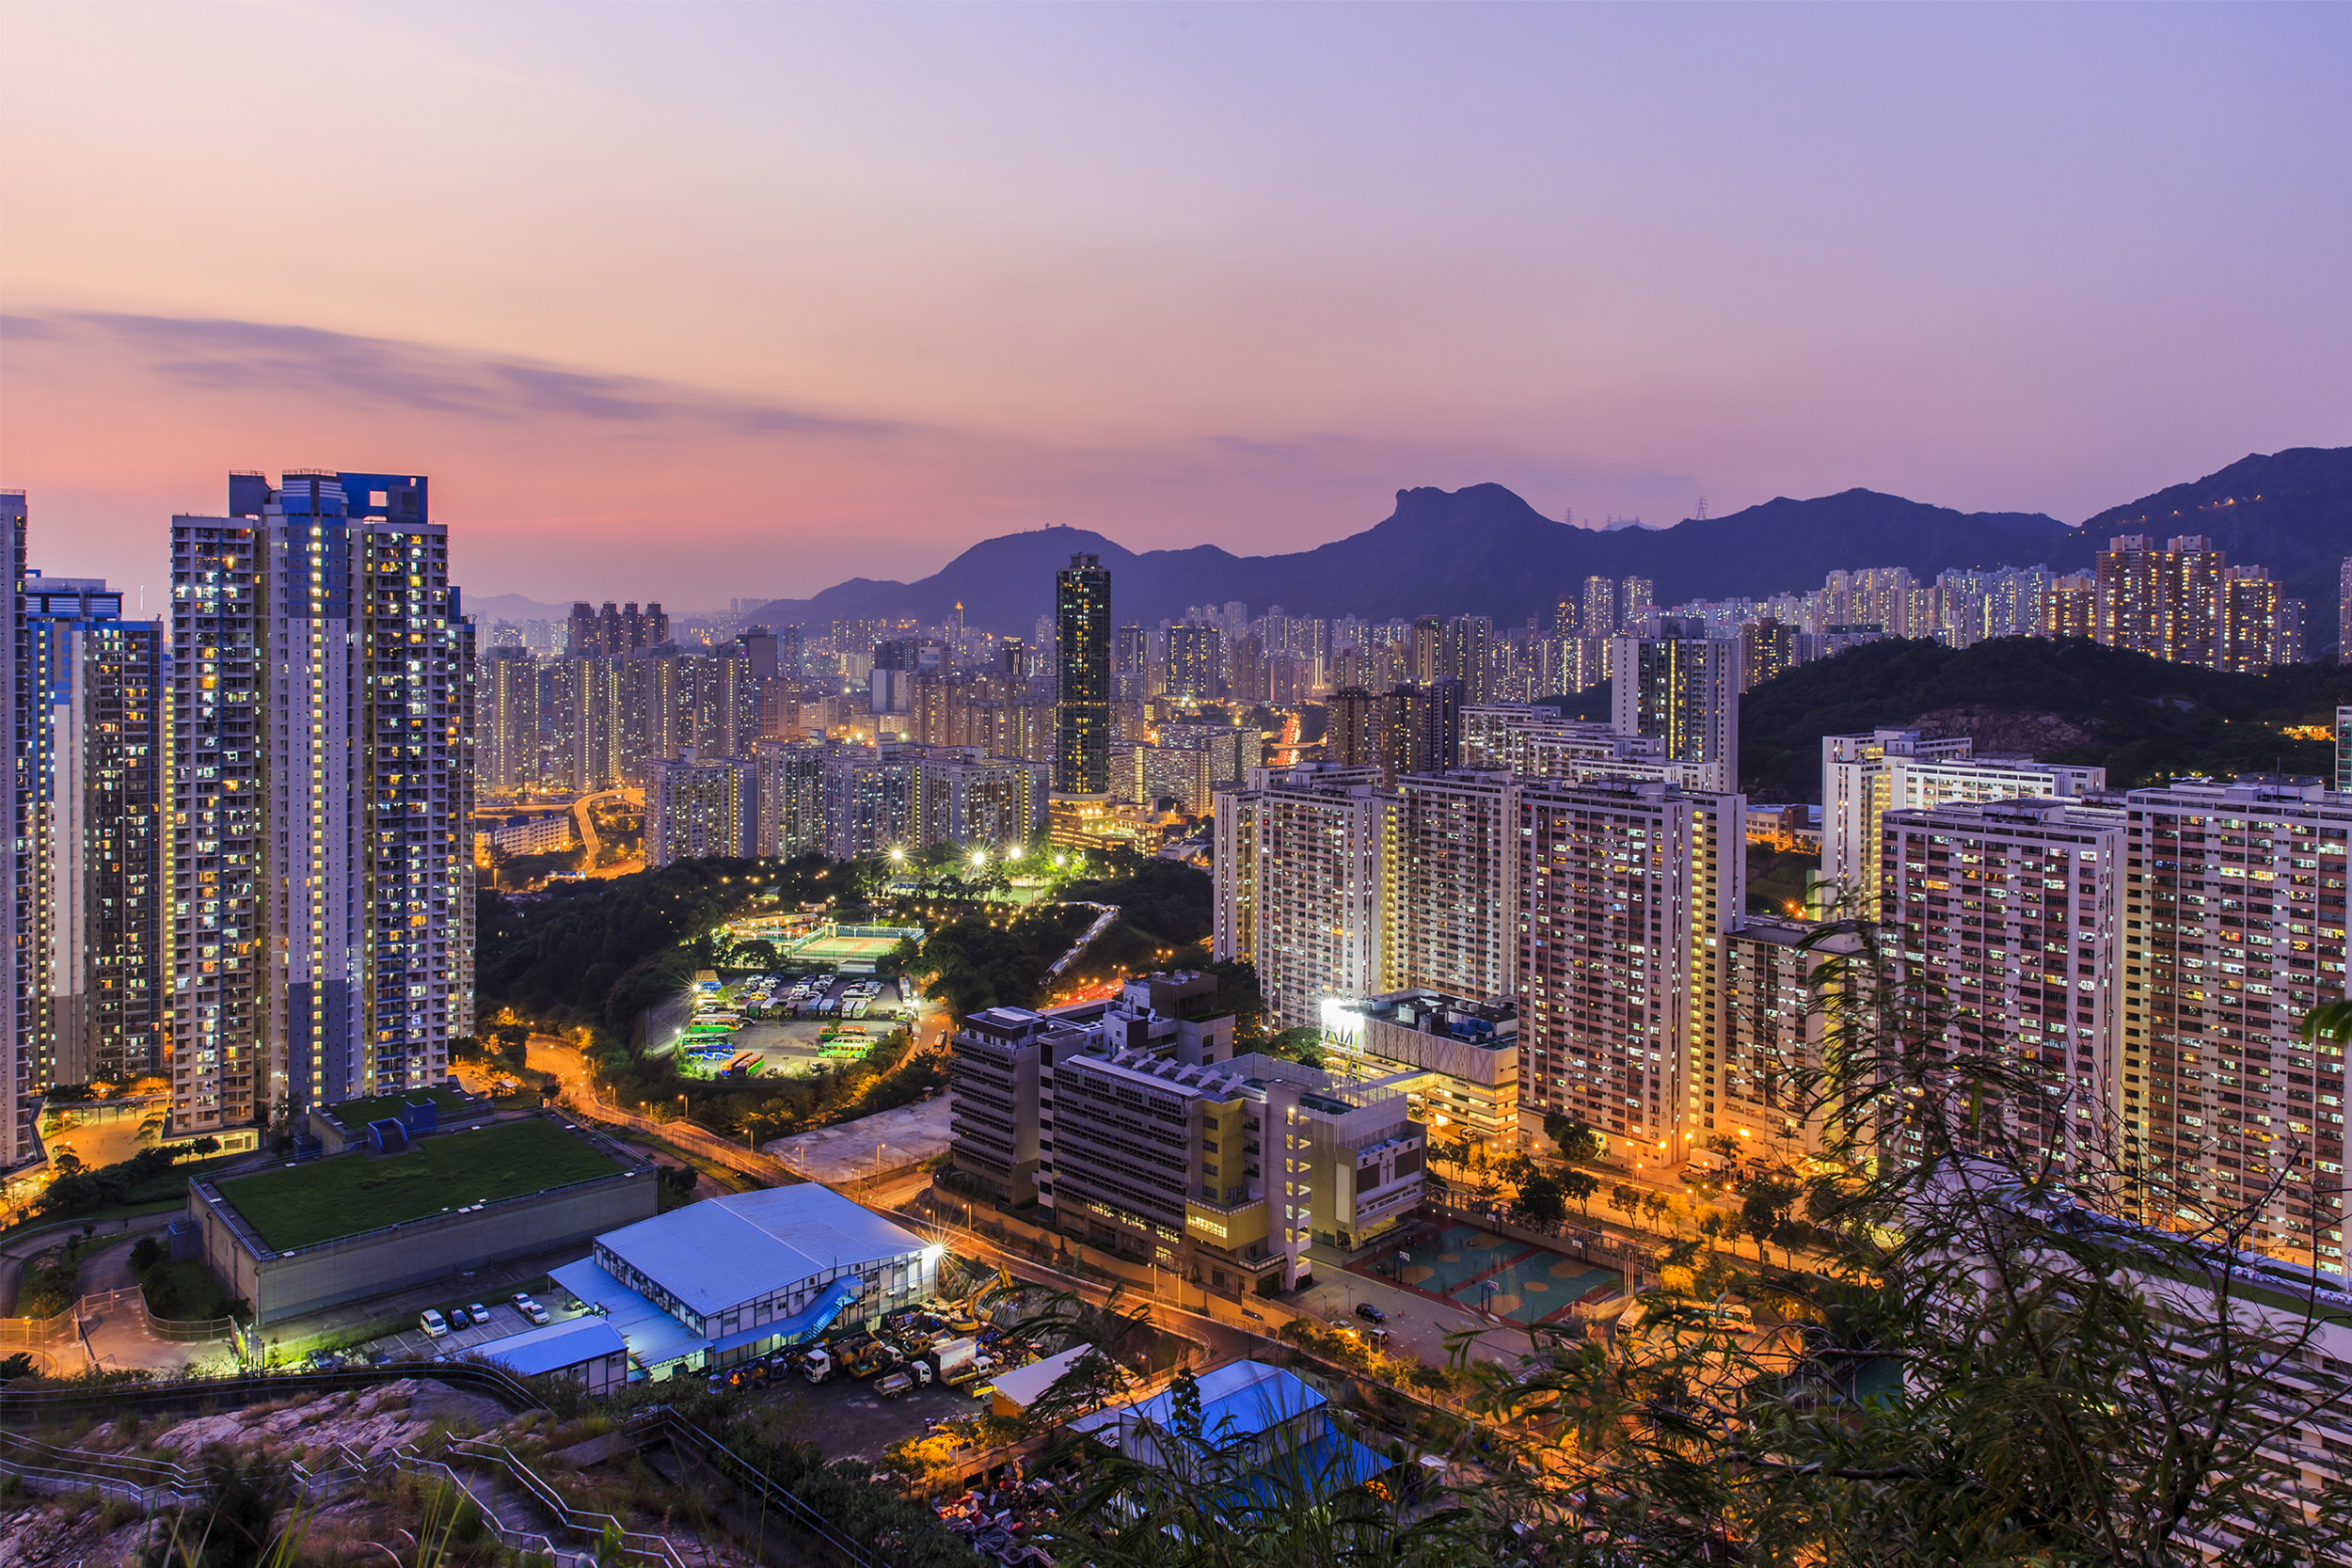 Sunset over Lion Rock in Hong Kong.